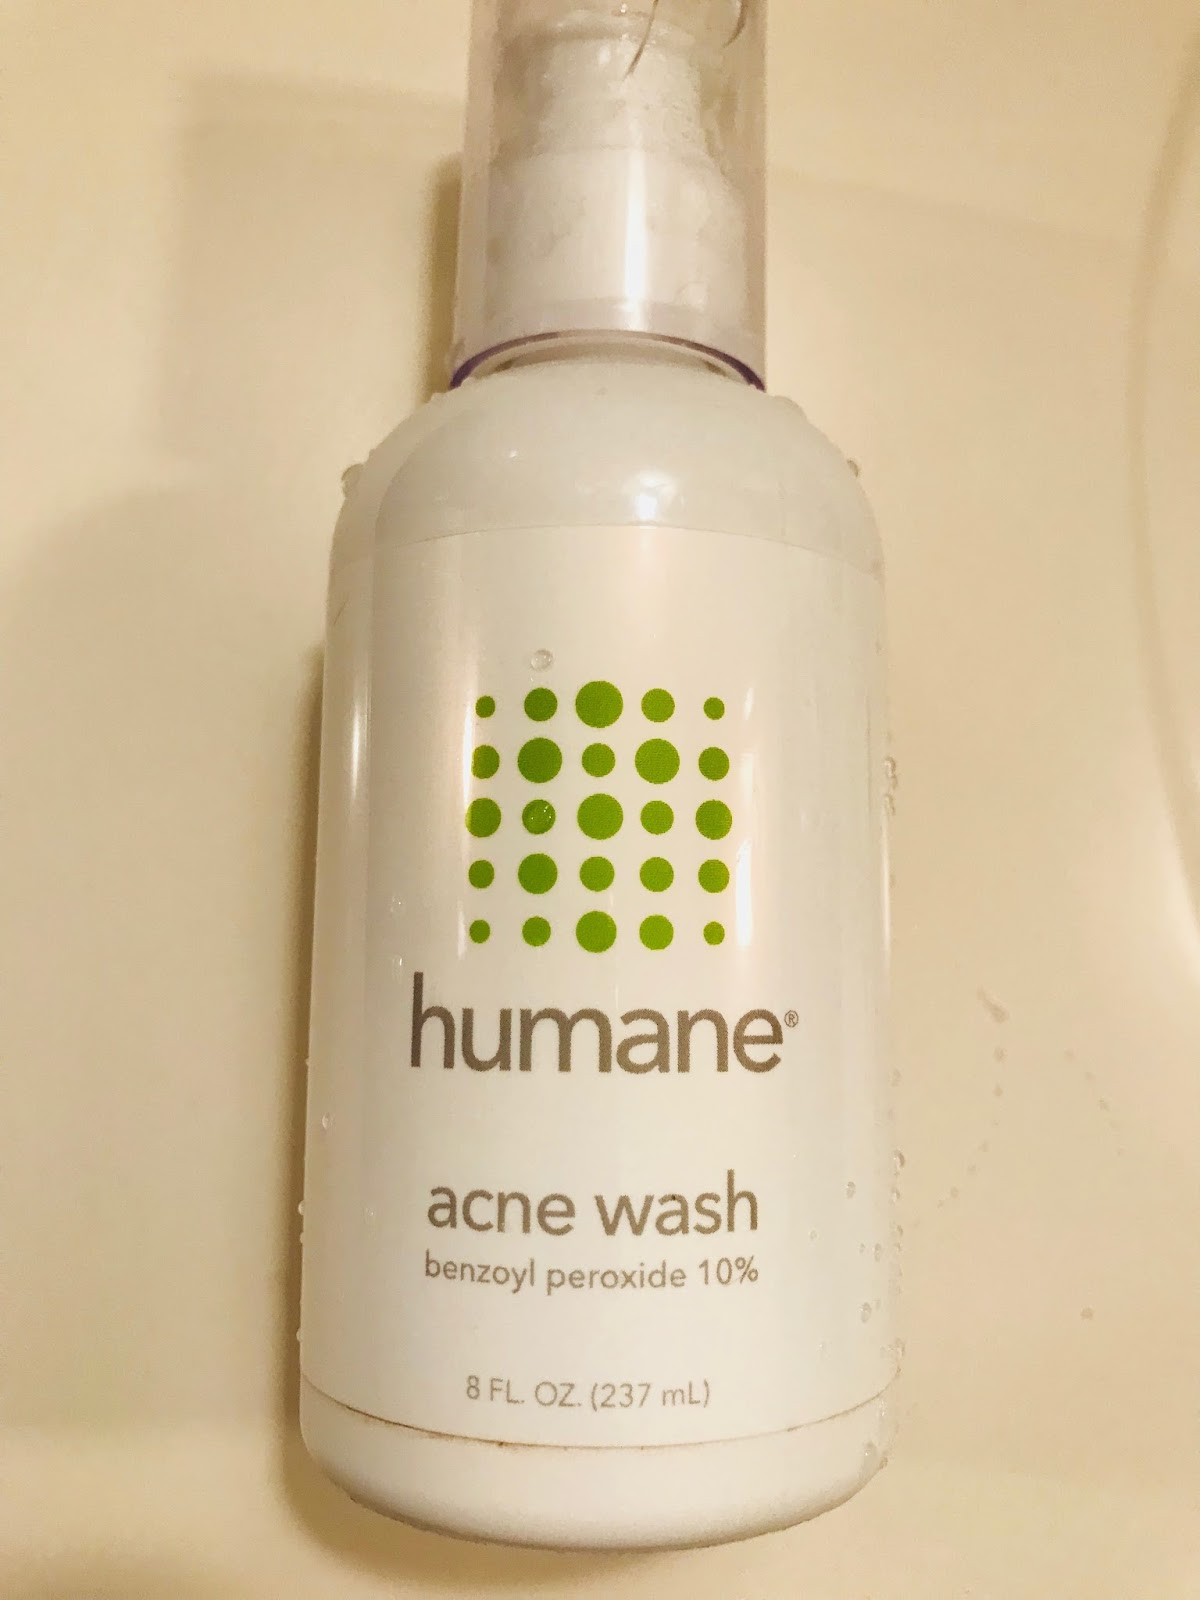 Humane Benzoyl Peroxide 10 Acne Treatment Wash Up on the ladder